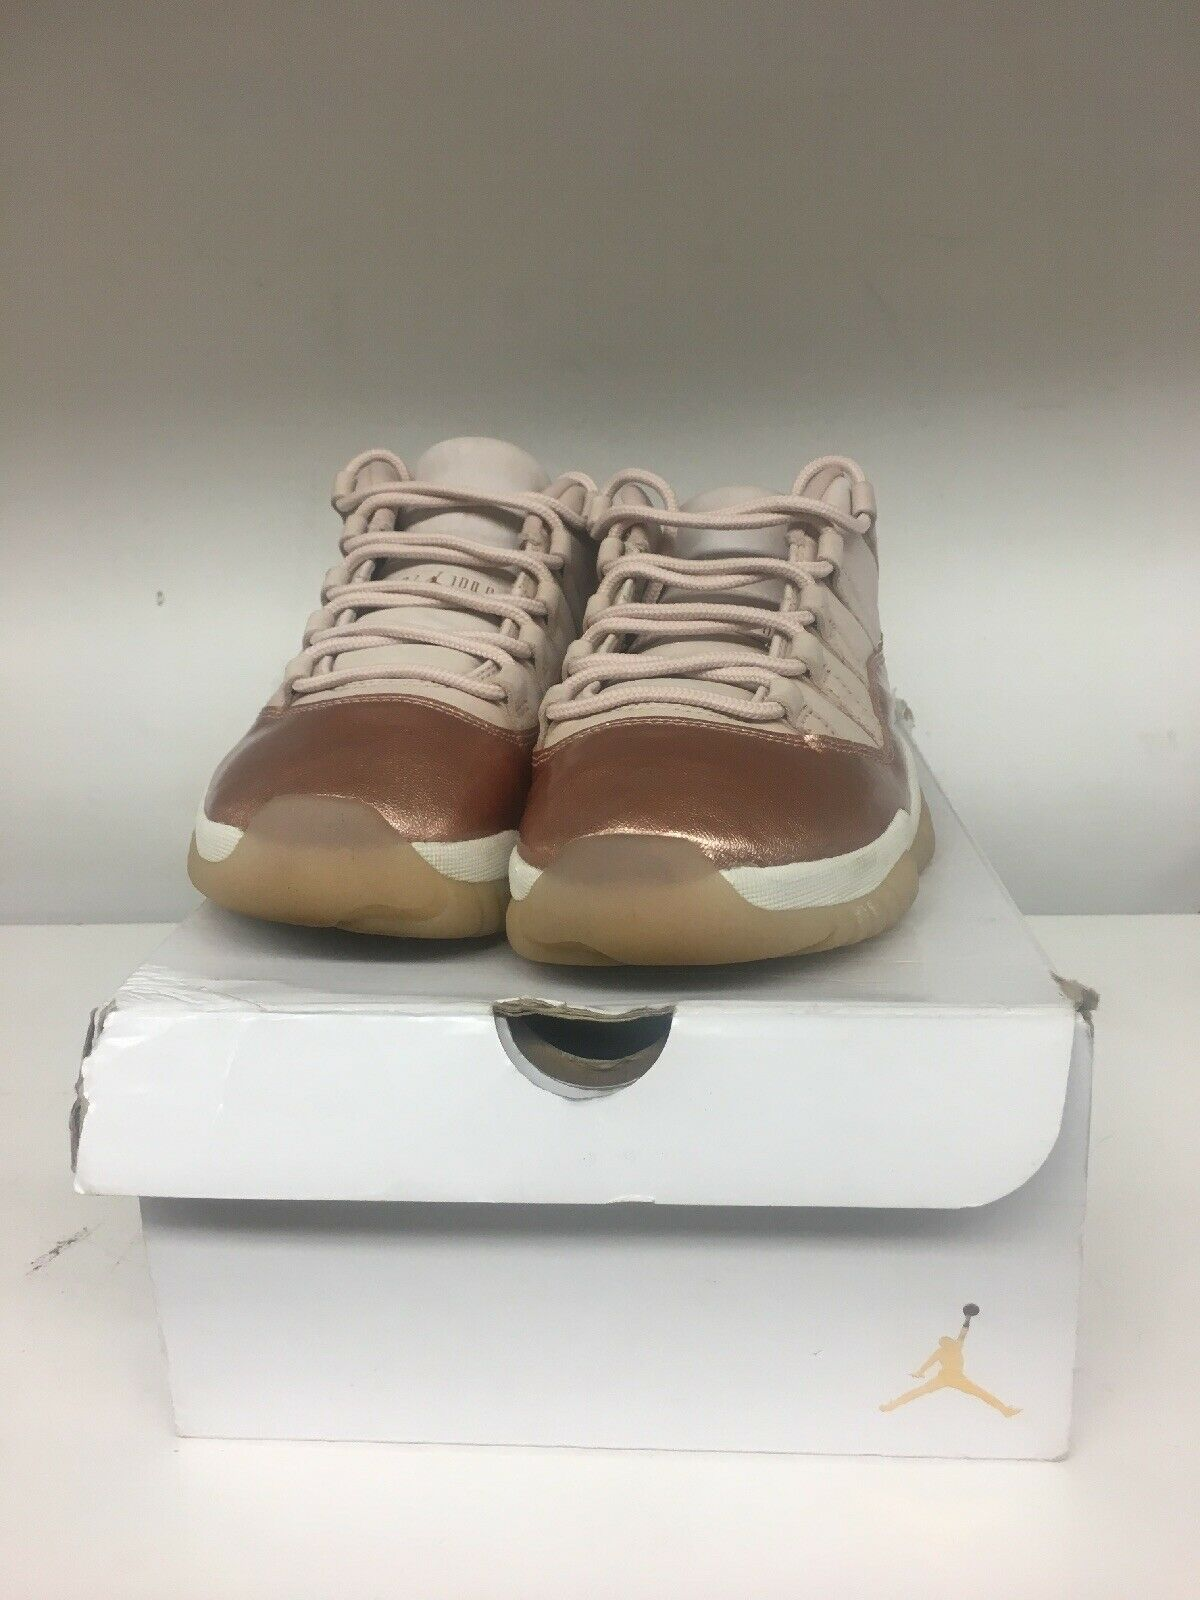 Wmns Air Jordan Retro 11 Low pink gold Bronze Size 9 (AH7860-105 )